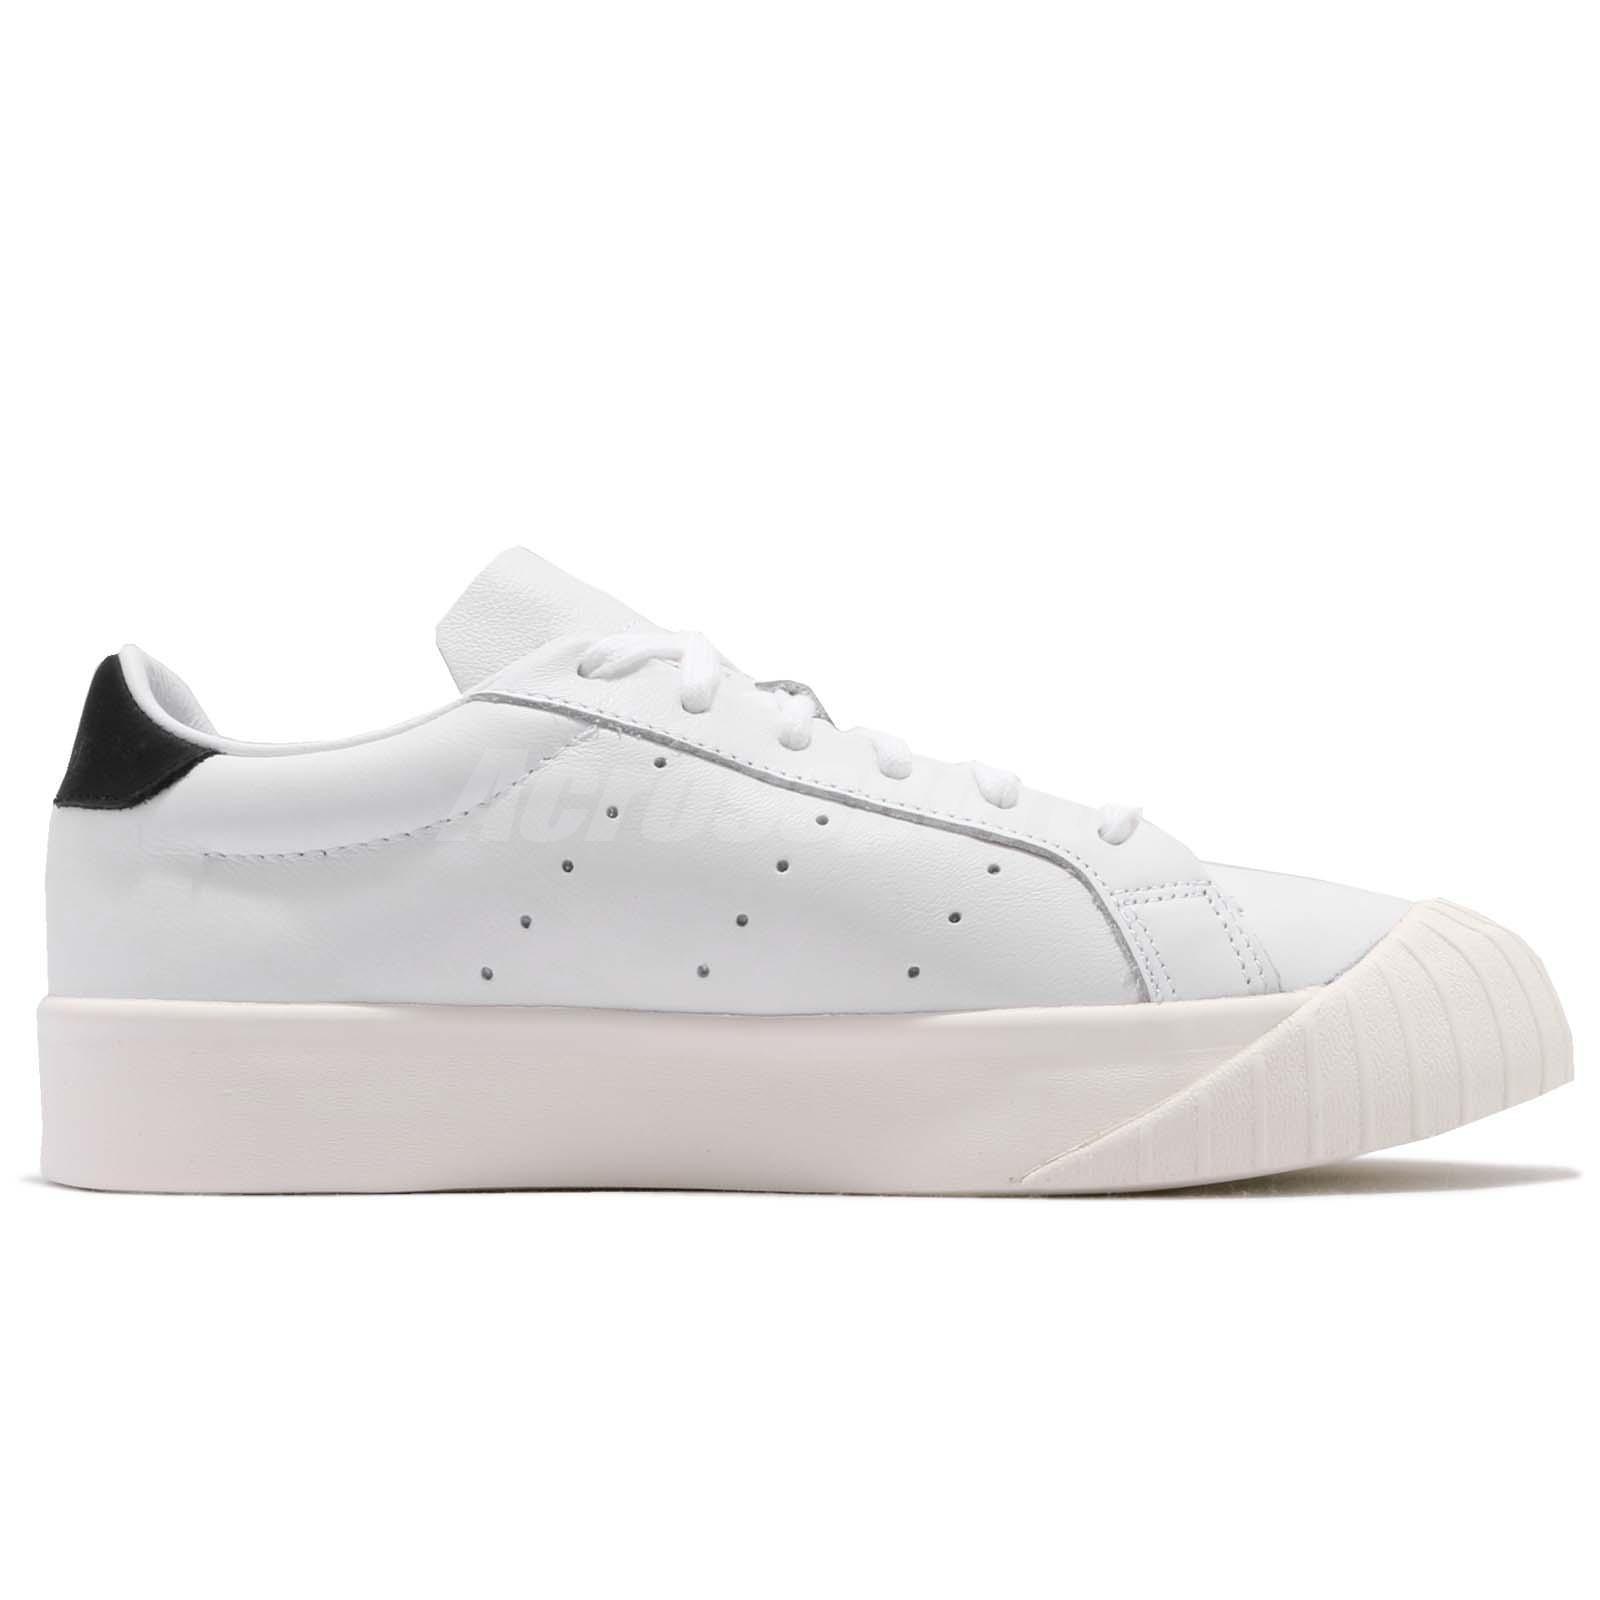 674d8d26bc Details about adidas Originals EVERYN W Classic Footwear White Black Women  Casual Shoes CQ2042